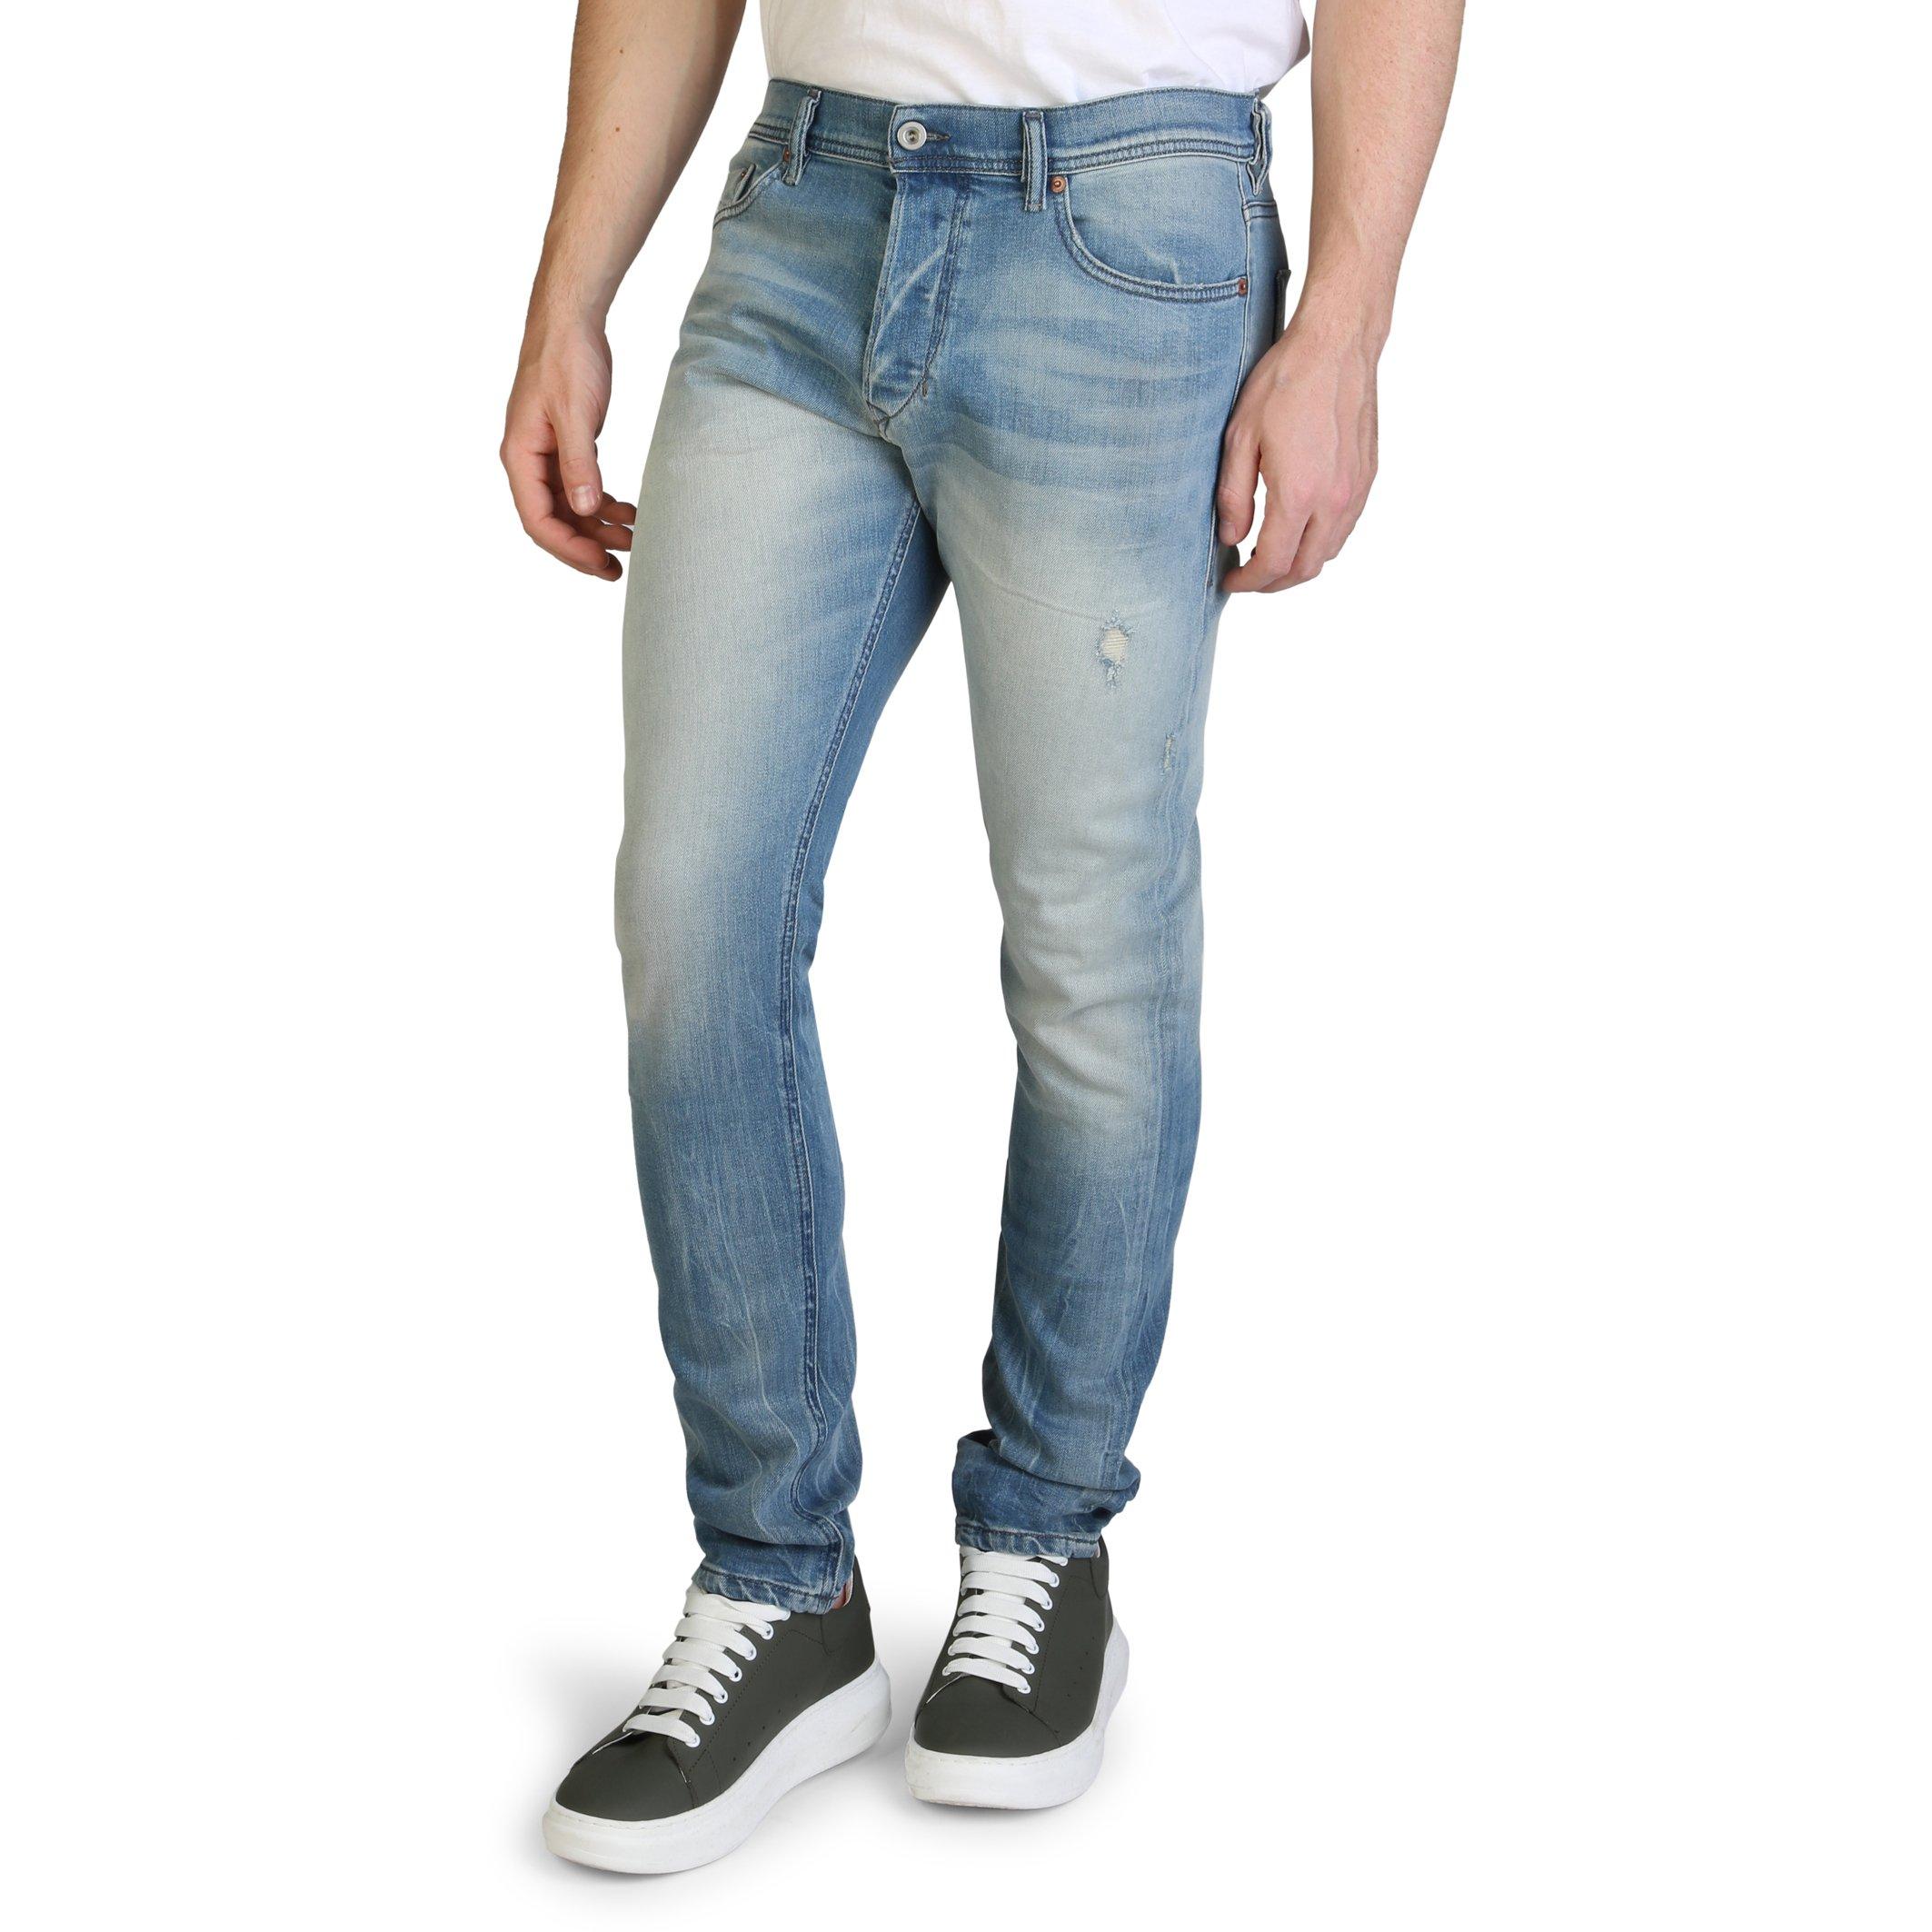 Diesel Men's Jeans Black TEPPHAR_L32_00CKRI - blue-1 29